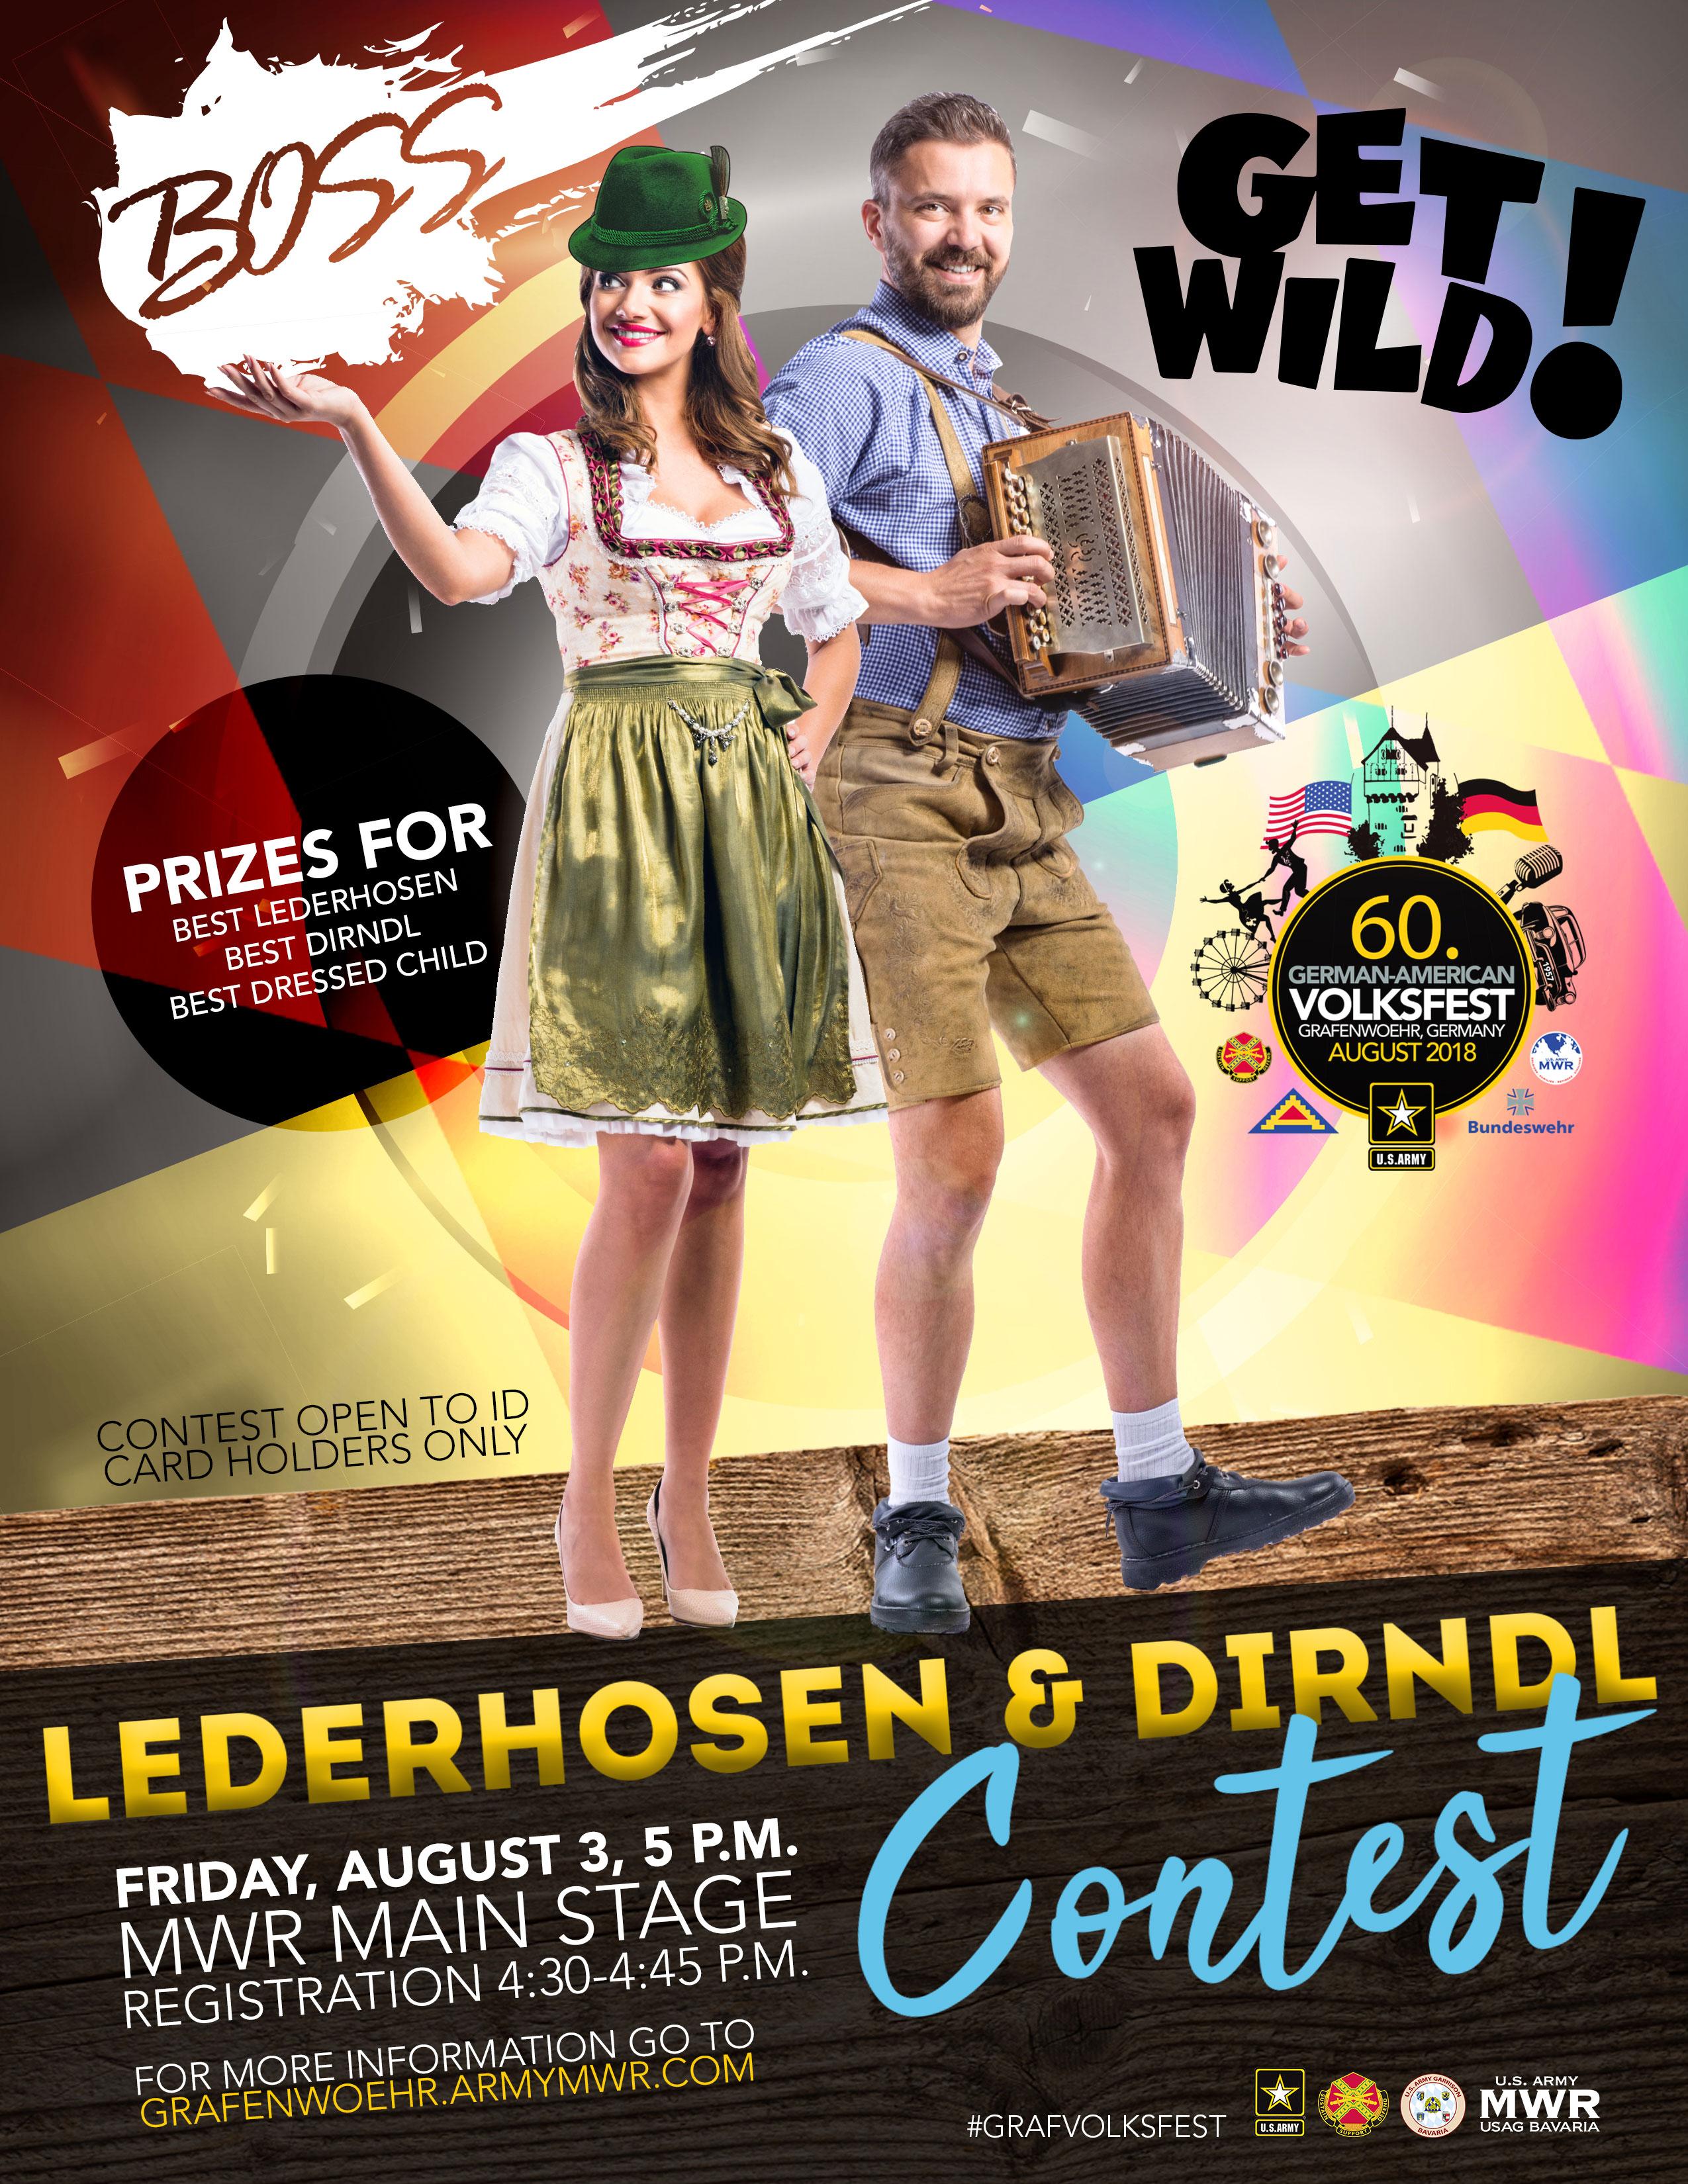 08-GR-Lederhosen-and-drindl-contest.jpg